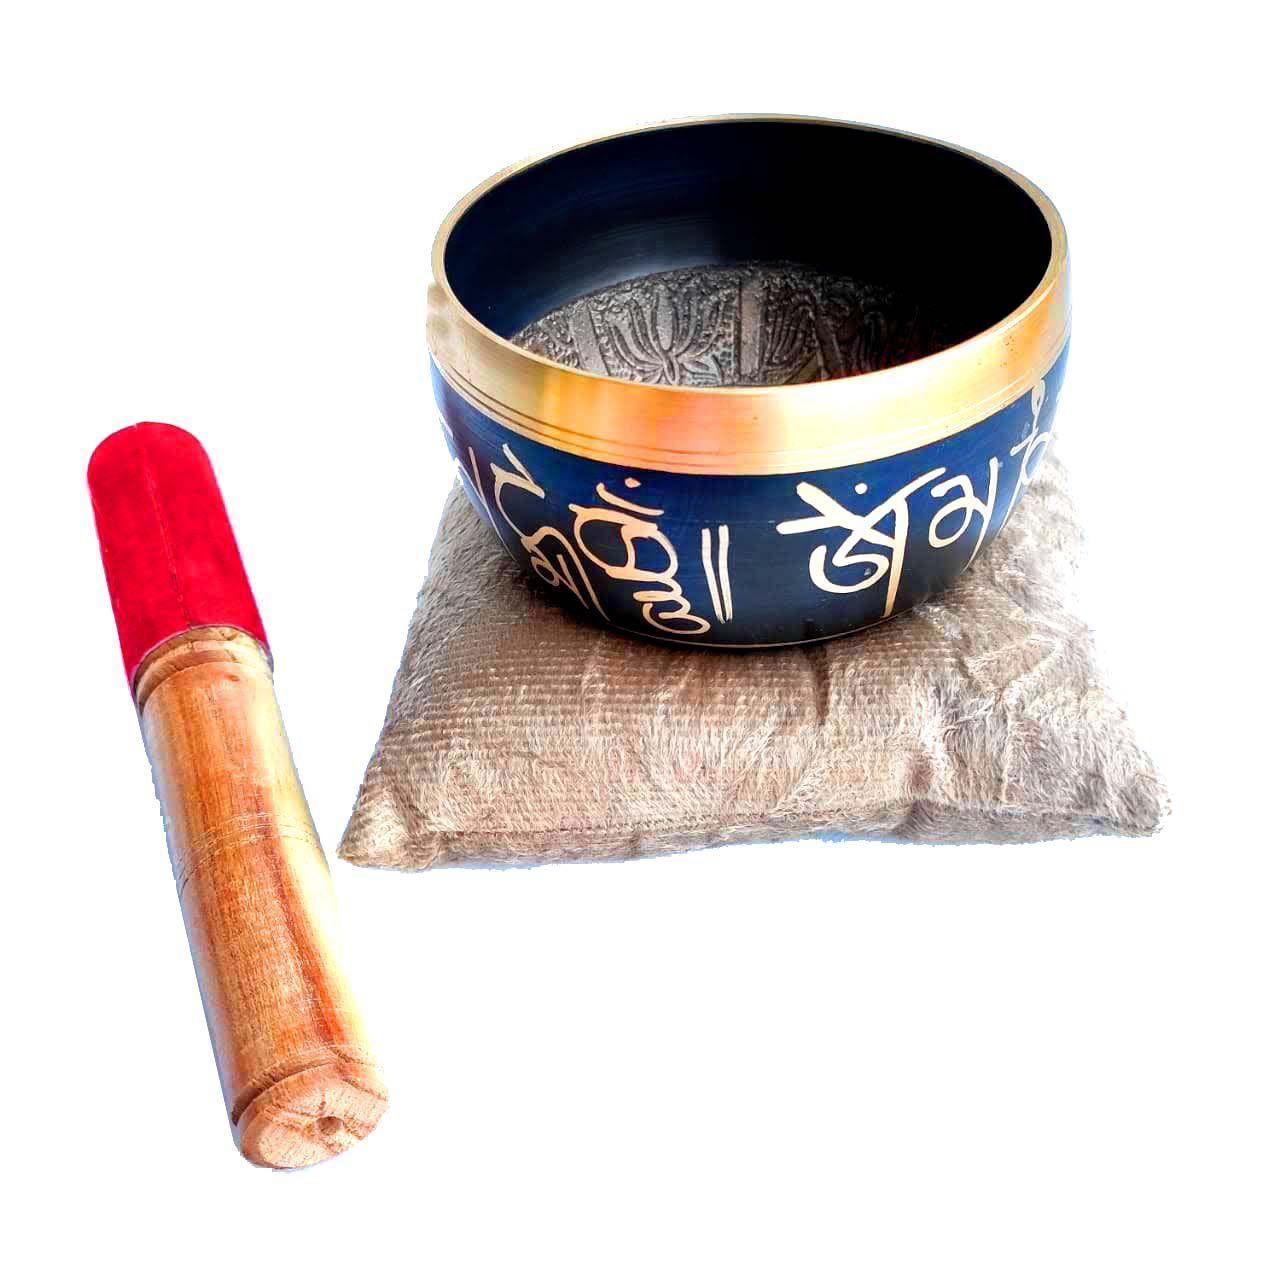 Sino Tigela Tibetana Orin Artesanal 7 Ligas de Metais 11cm + Almofada